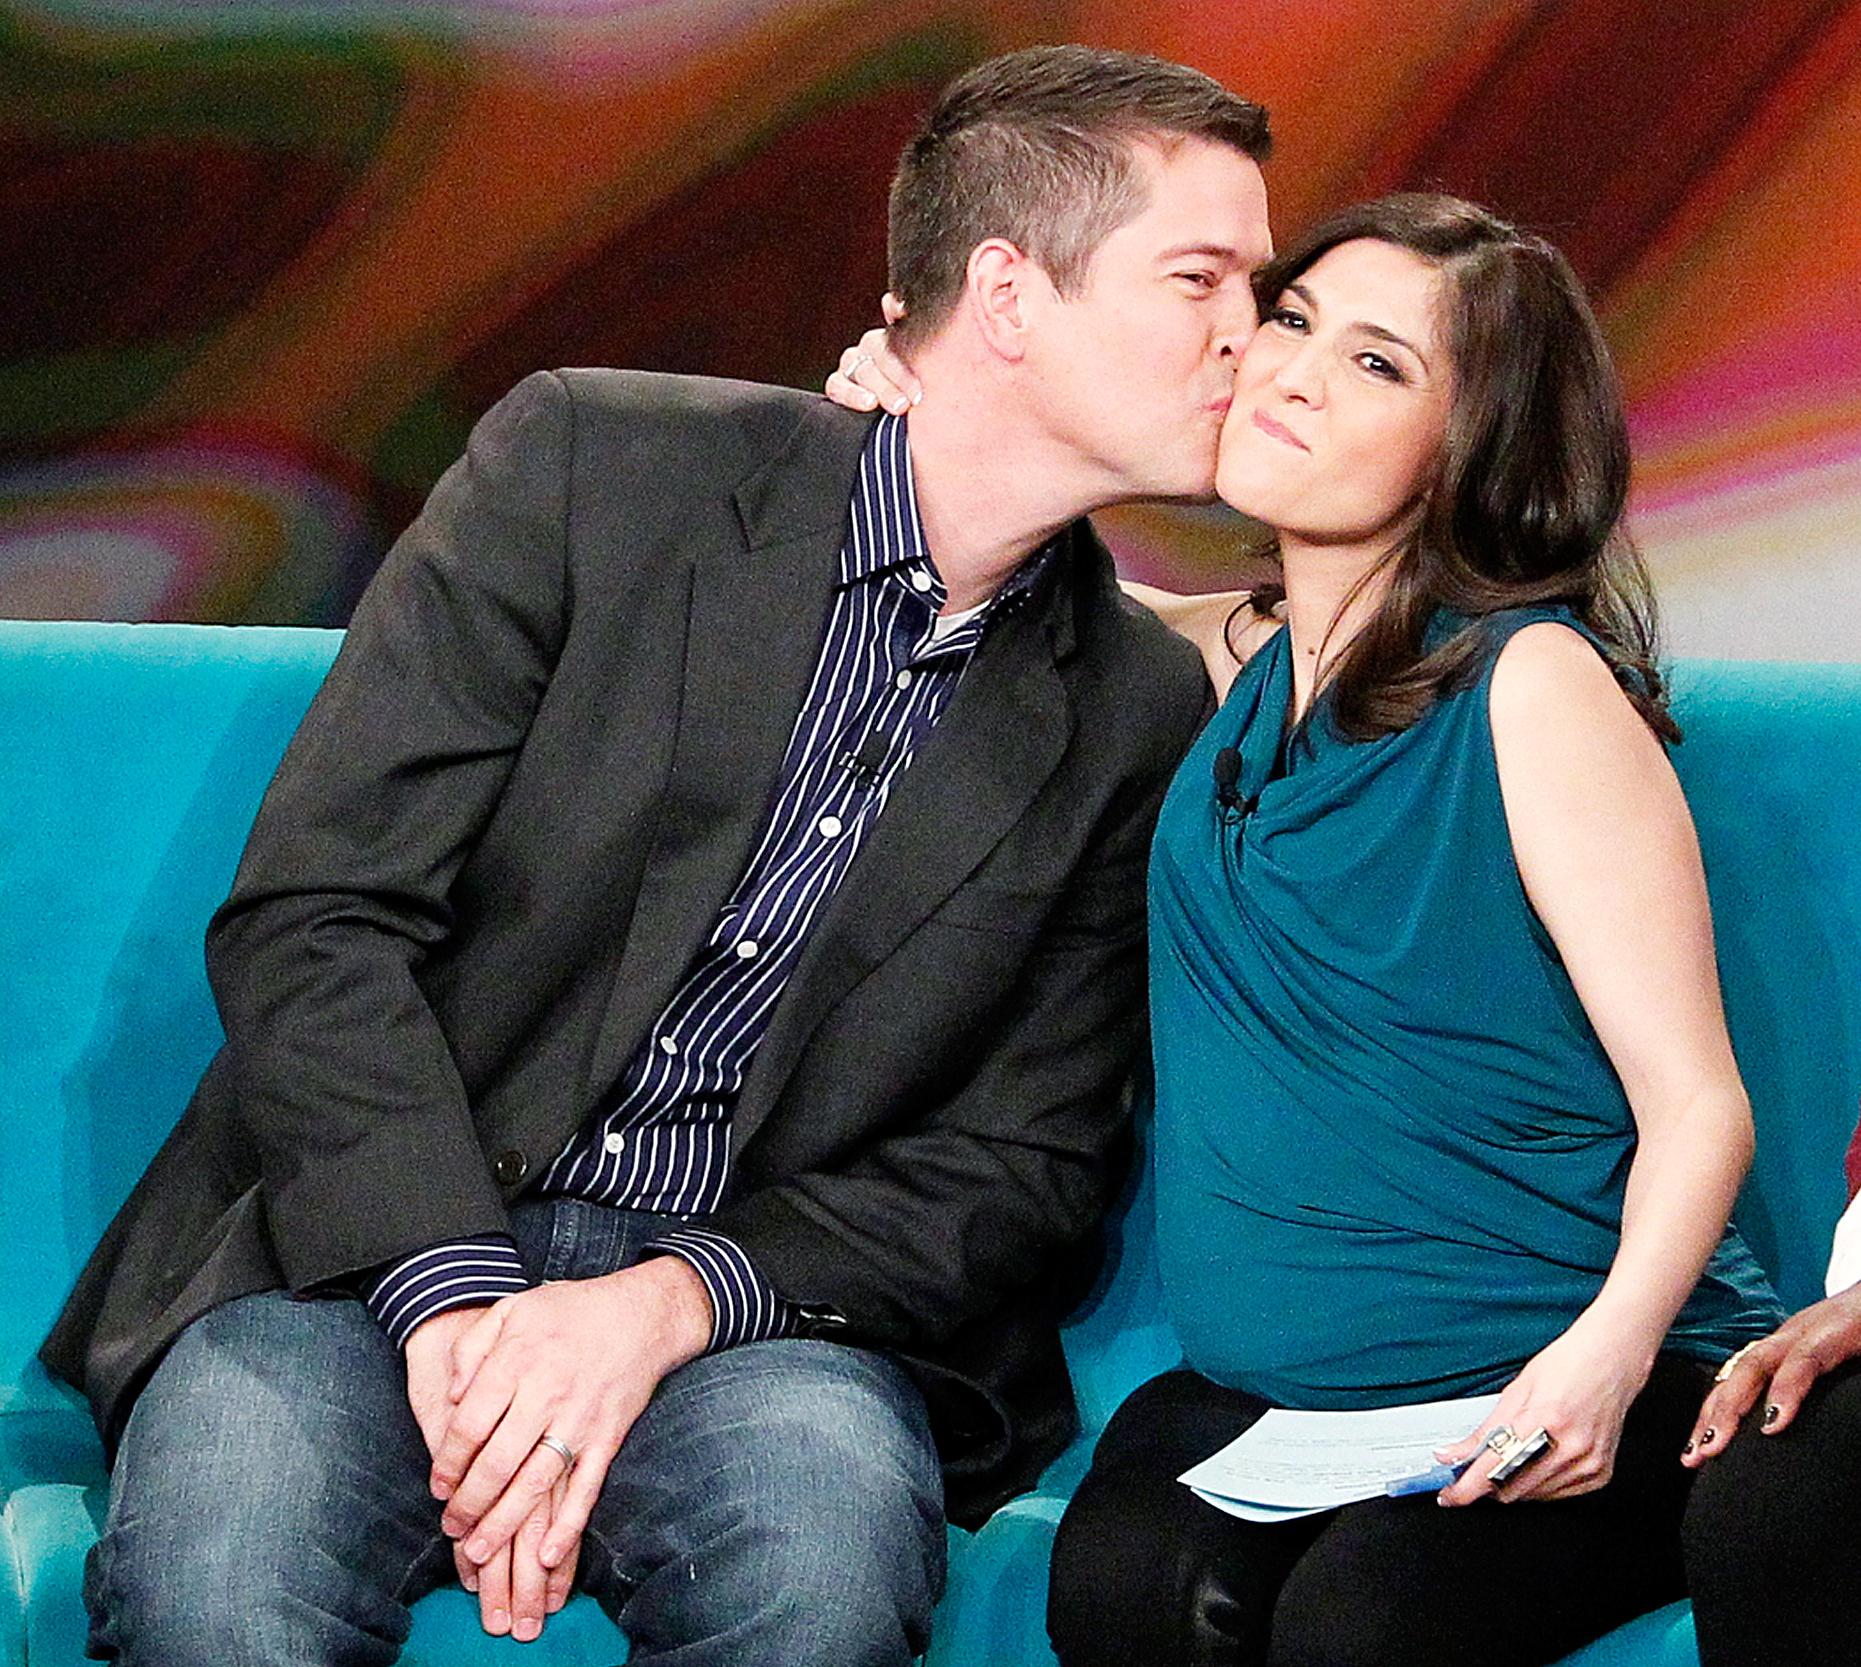 Sean Duffy and Rachel Campos-Duffy